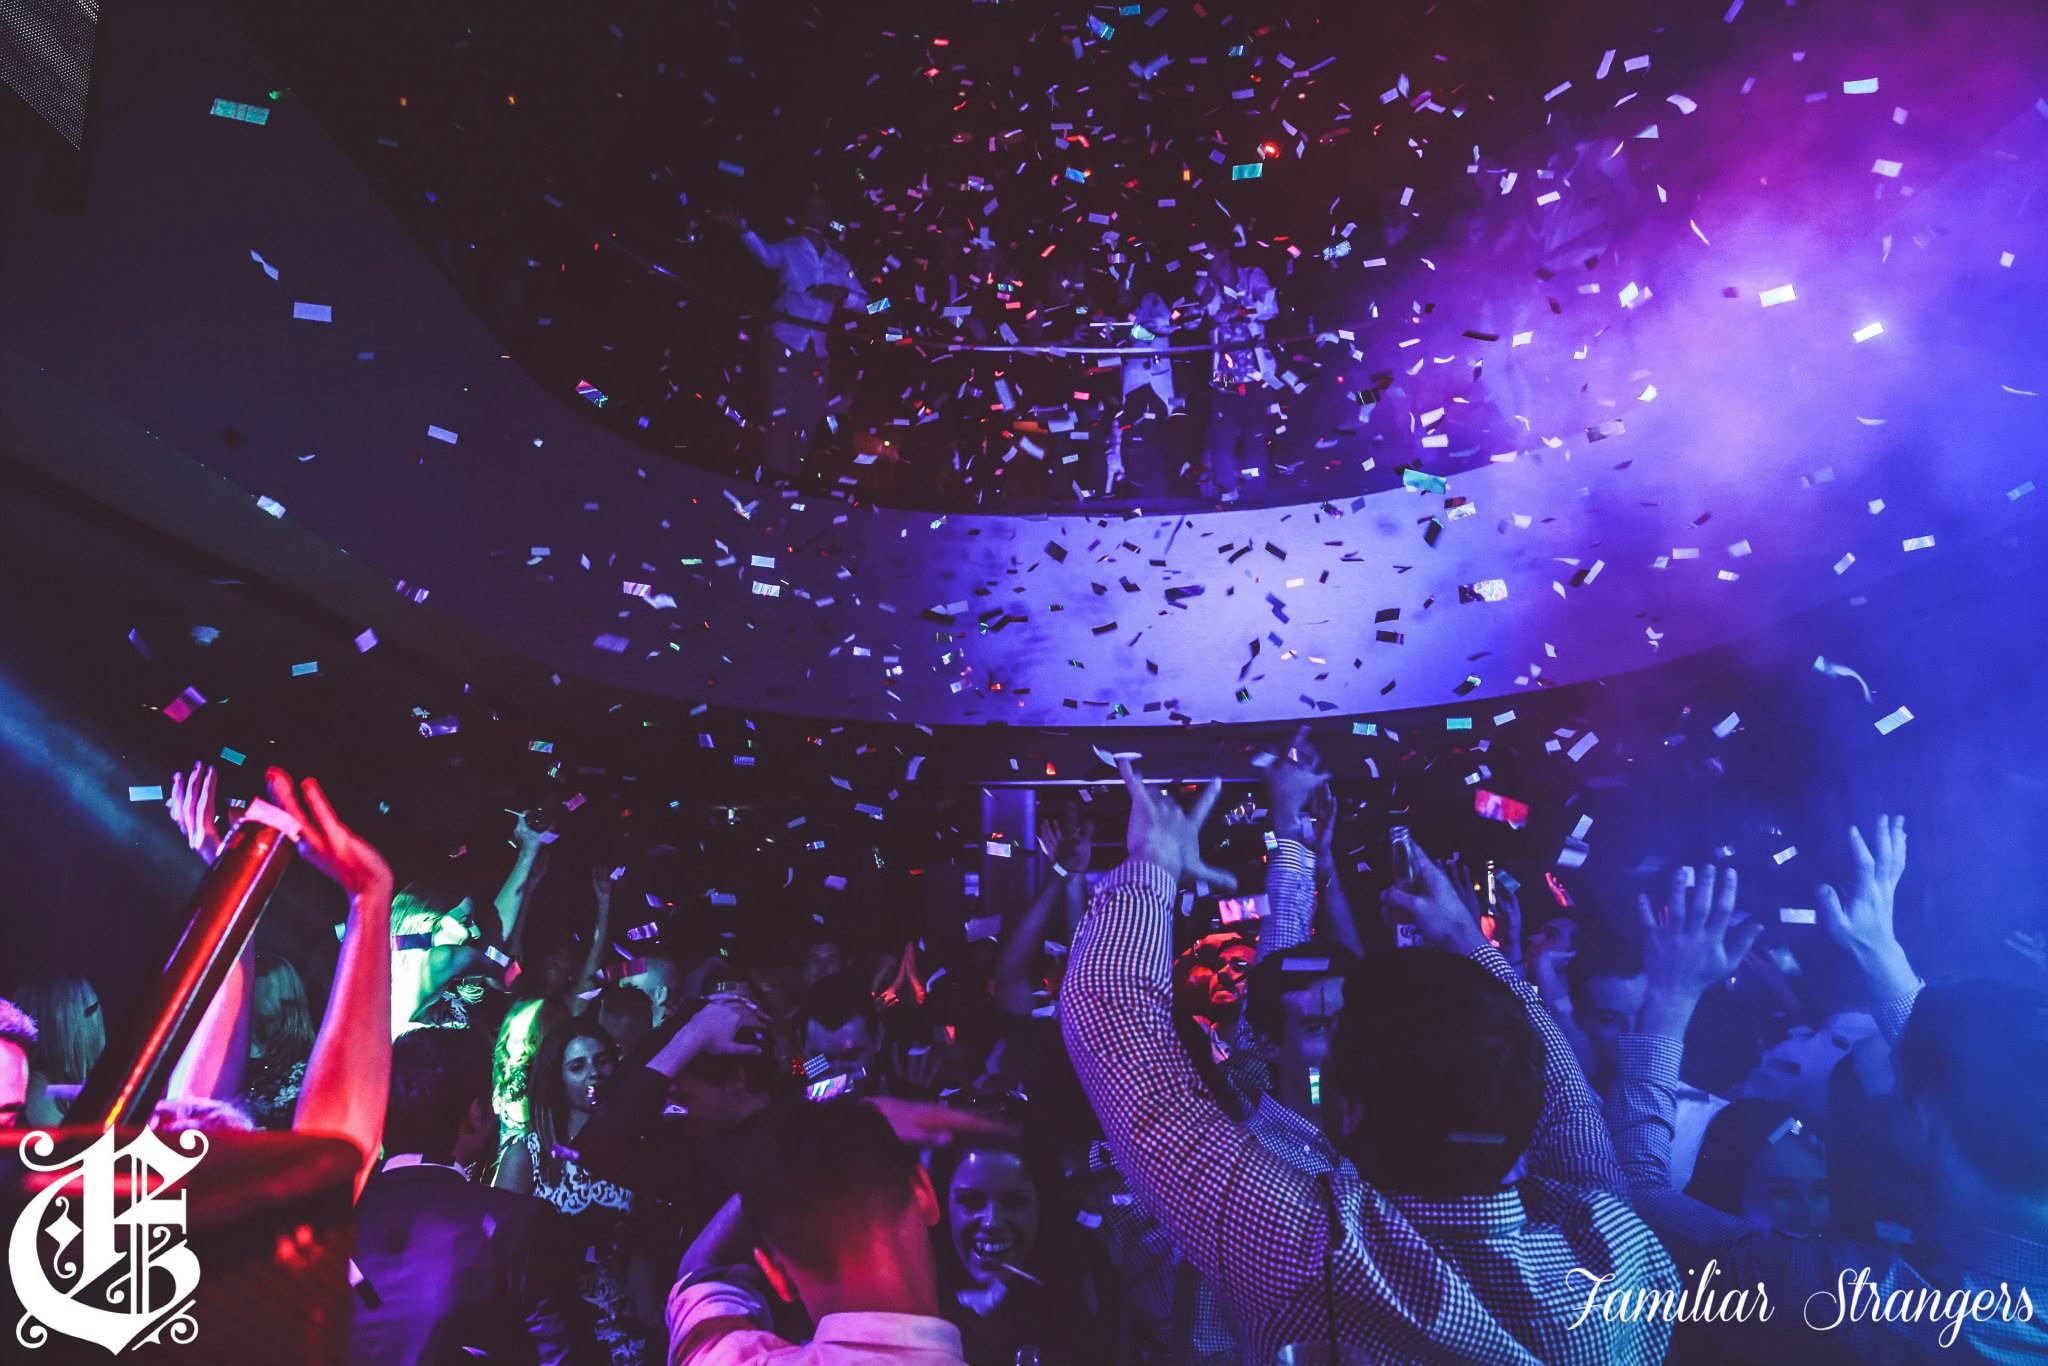 Confetti Cannons fired in Melbourne Club The Emerson - Blaso Pyrotechnics